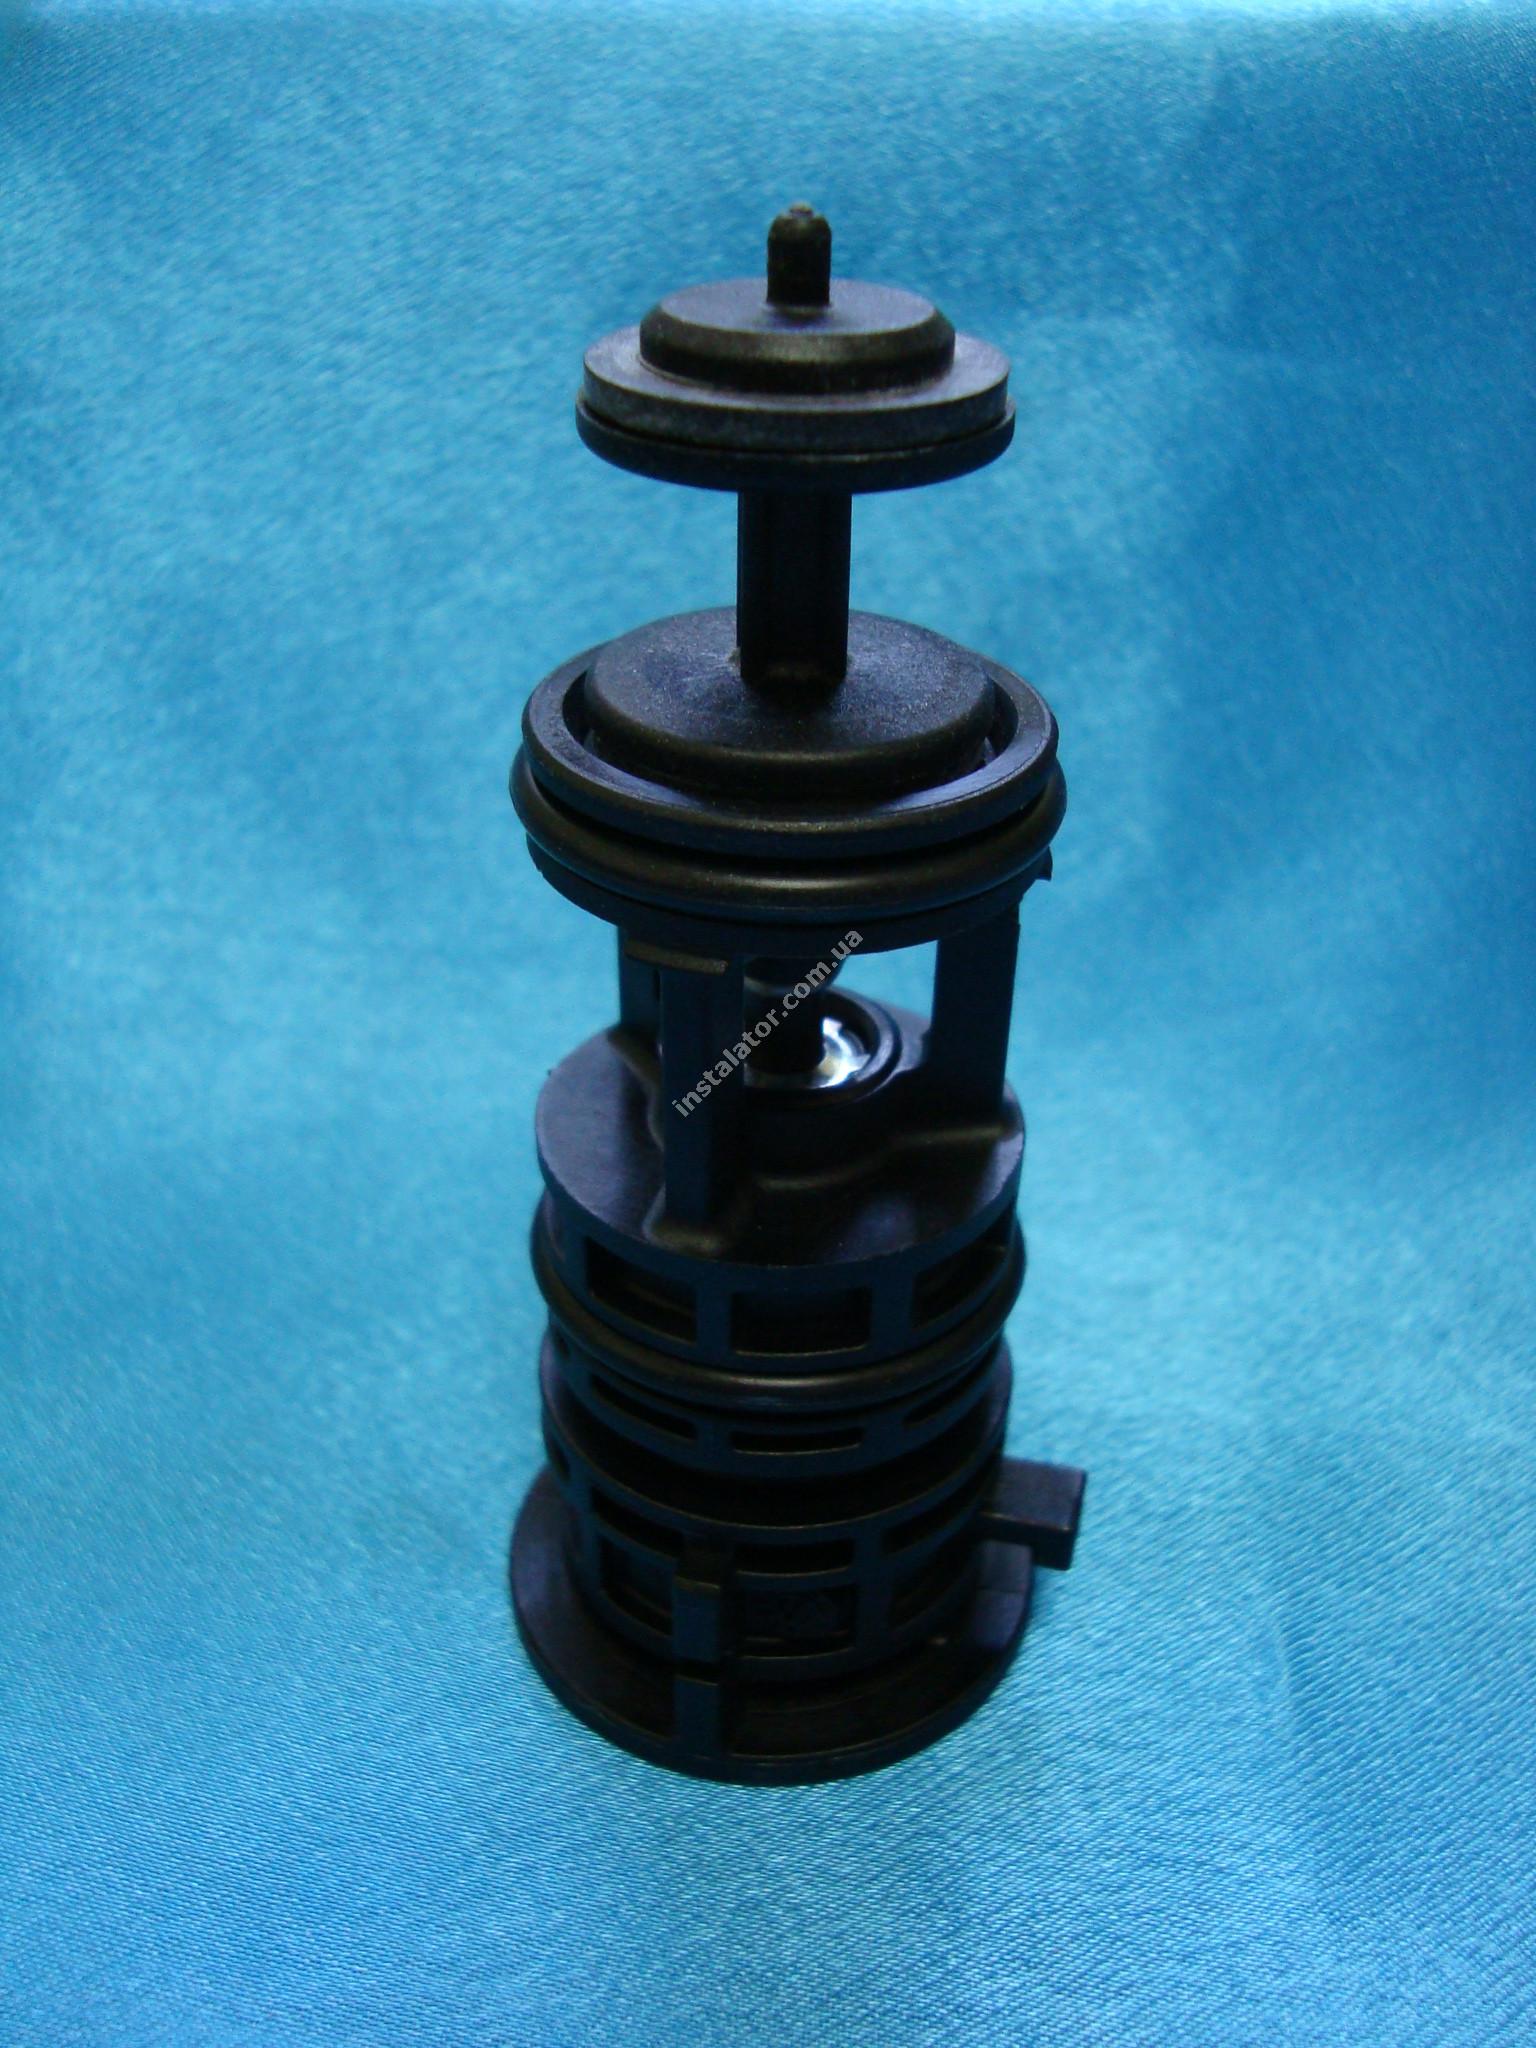 721403800 Картридж 3-х ходового клапана котла Baxi ECO full-image-1